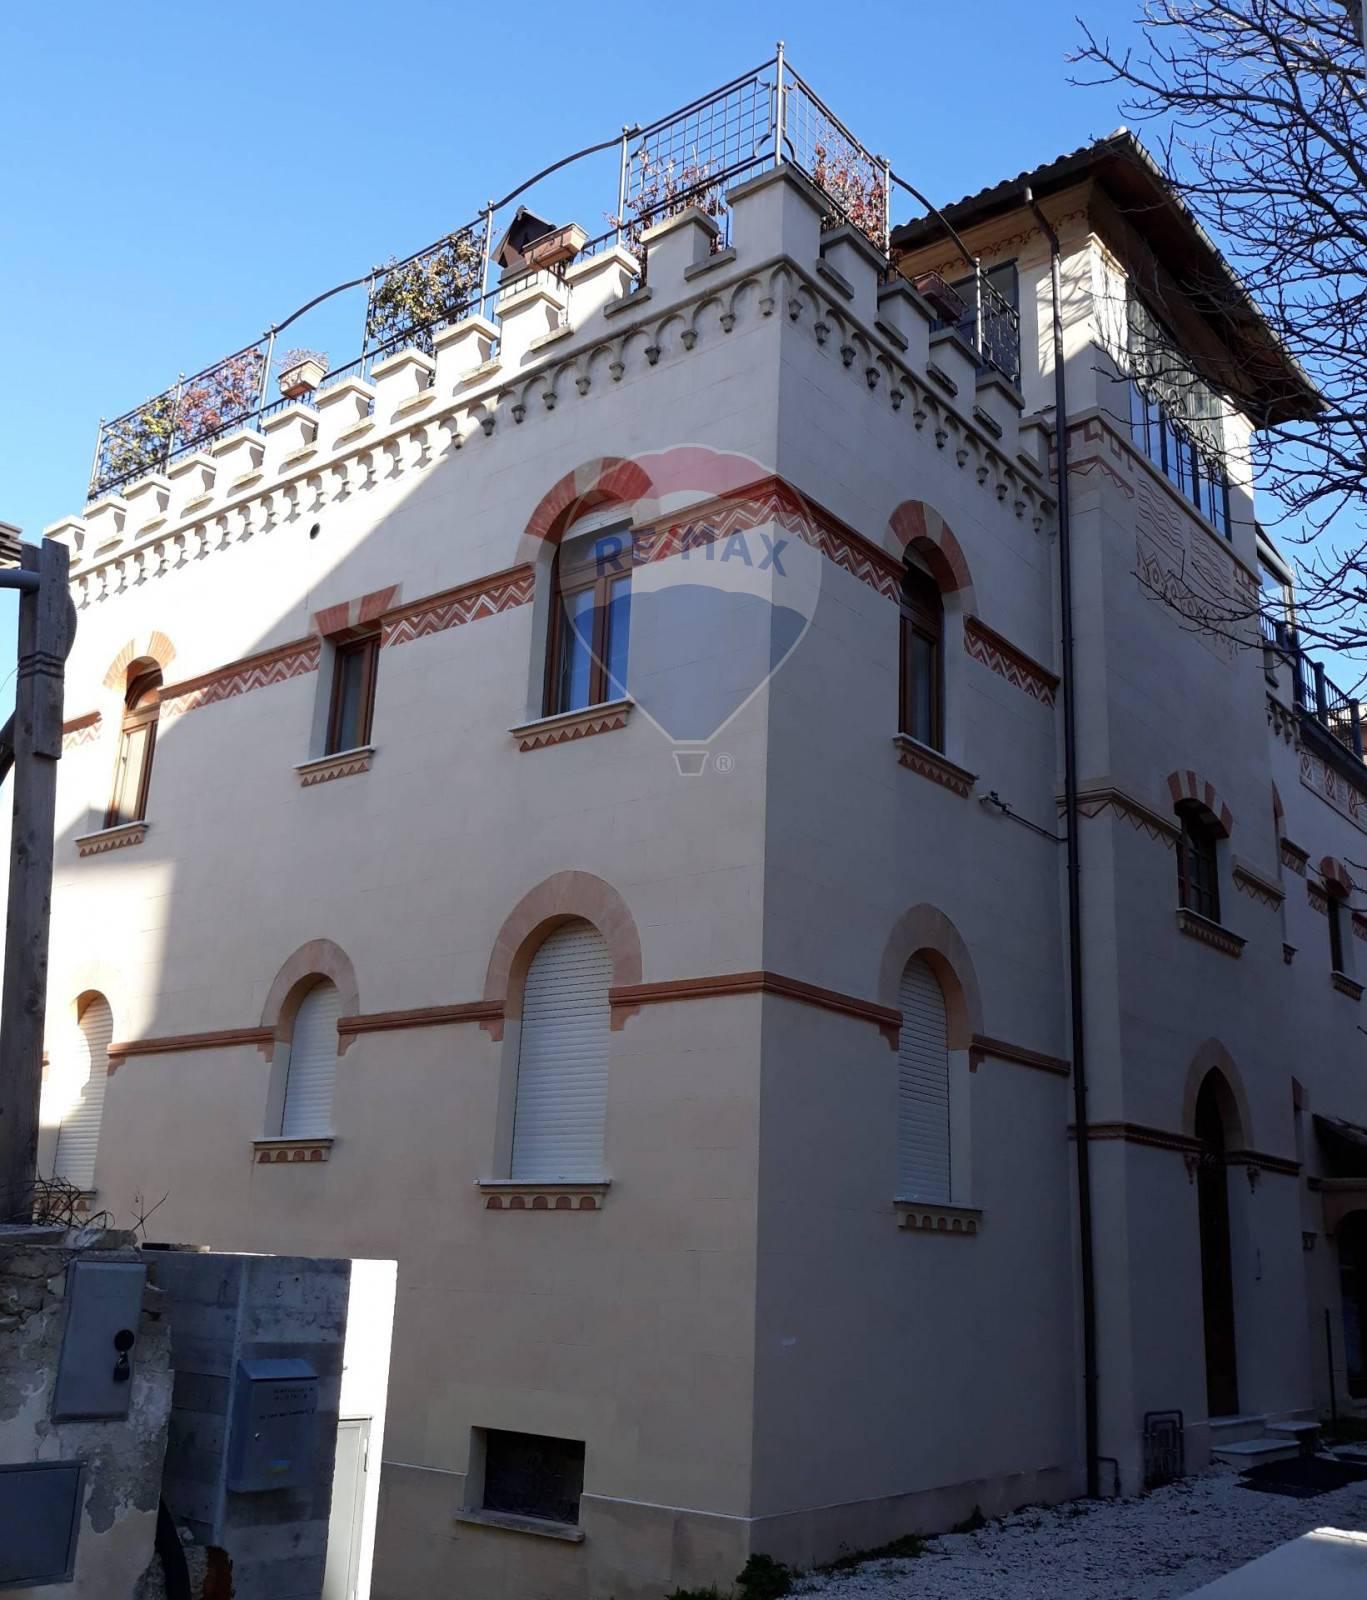 Appartamento, 60 Mq, Affitto - L'aquila (L'Aquila)